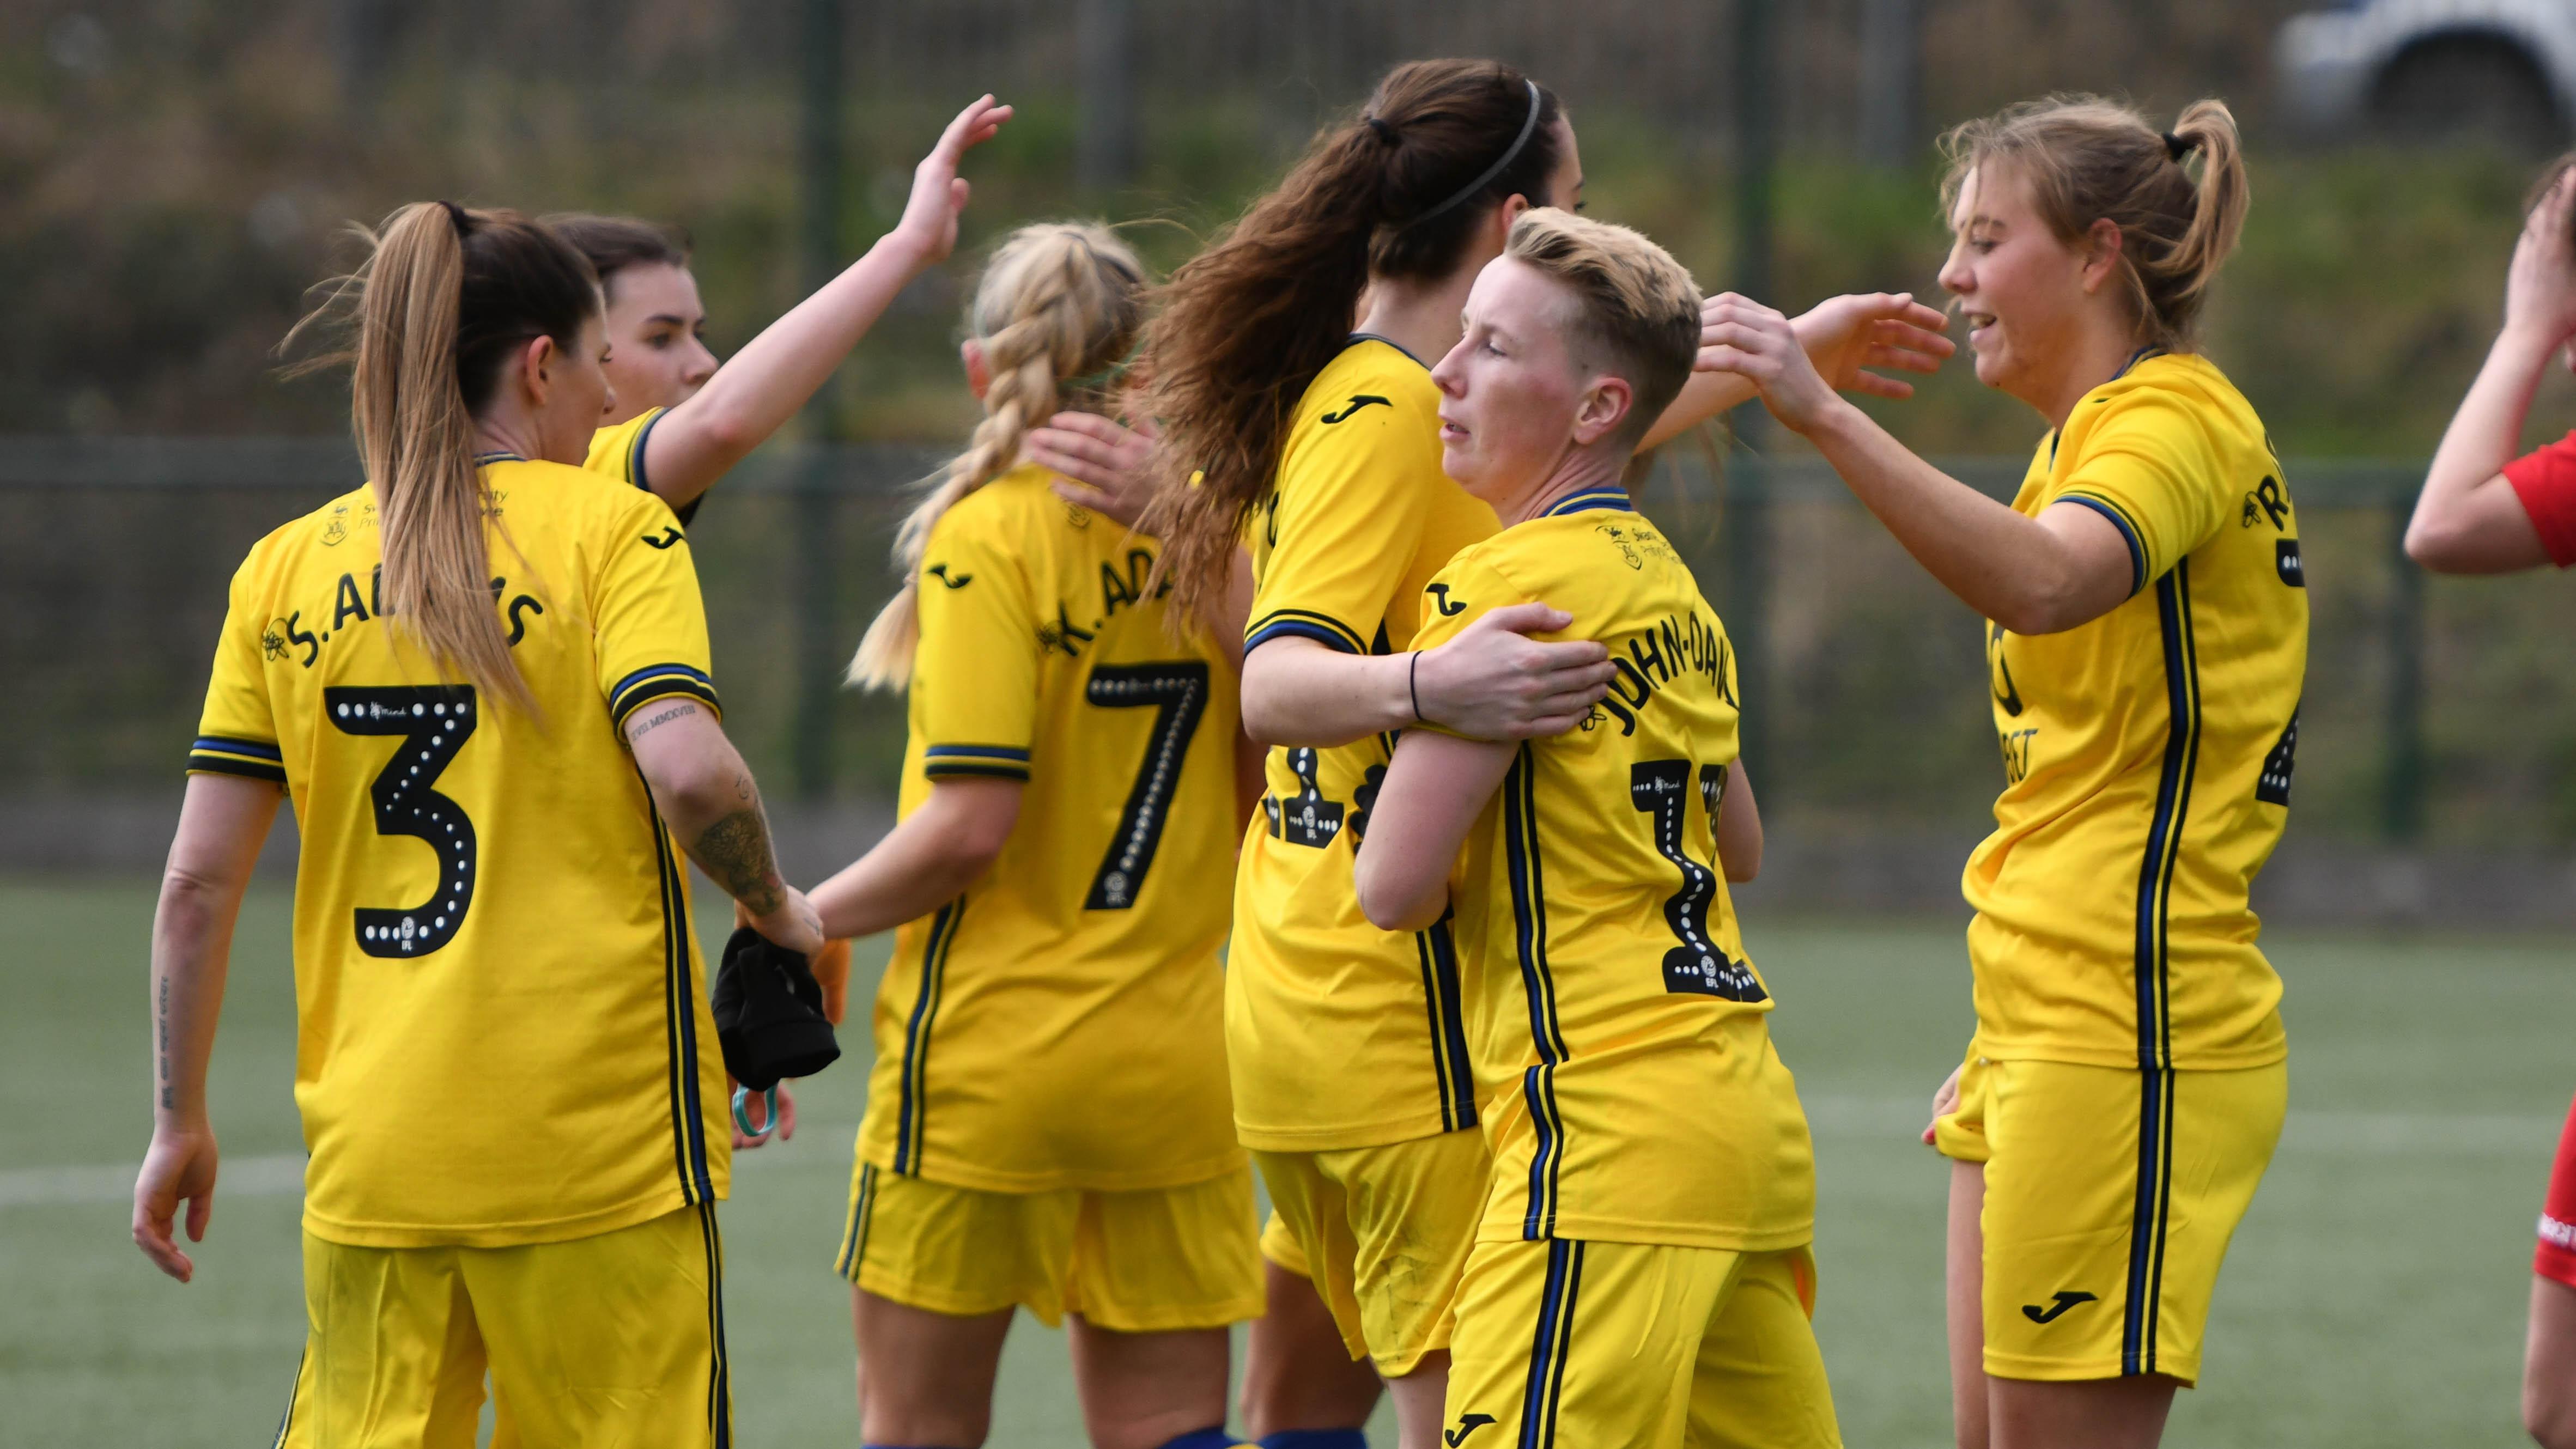 Swansea City Ladies celebrate a goal